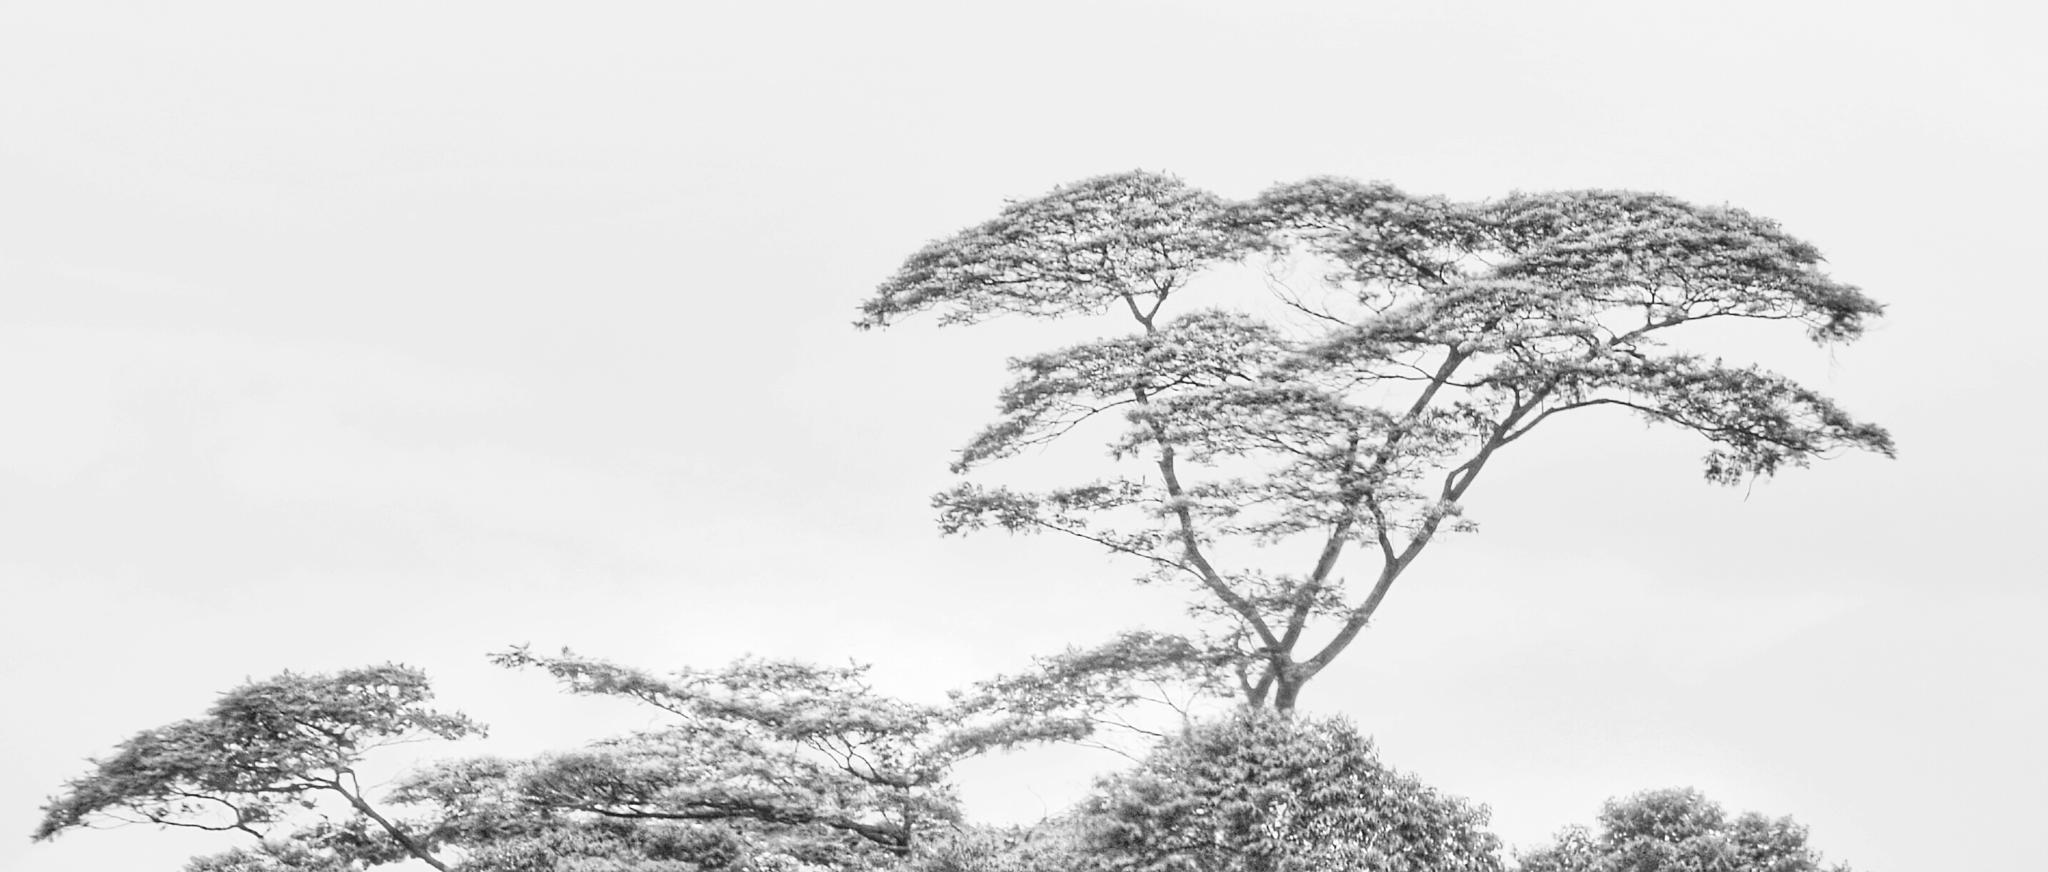 Just tree by bambang irawan